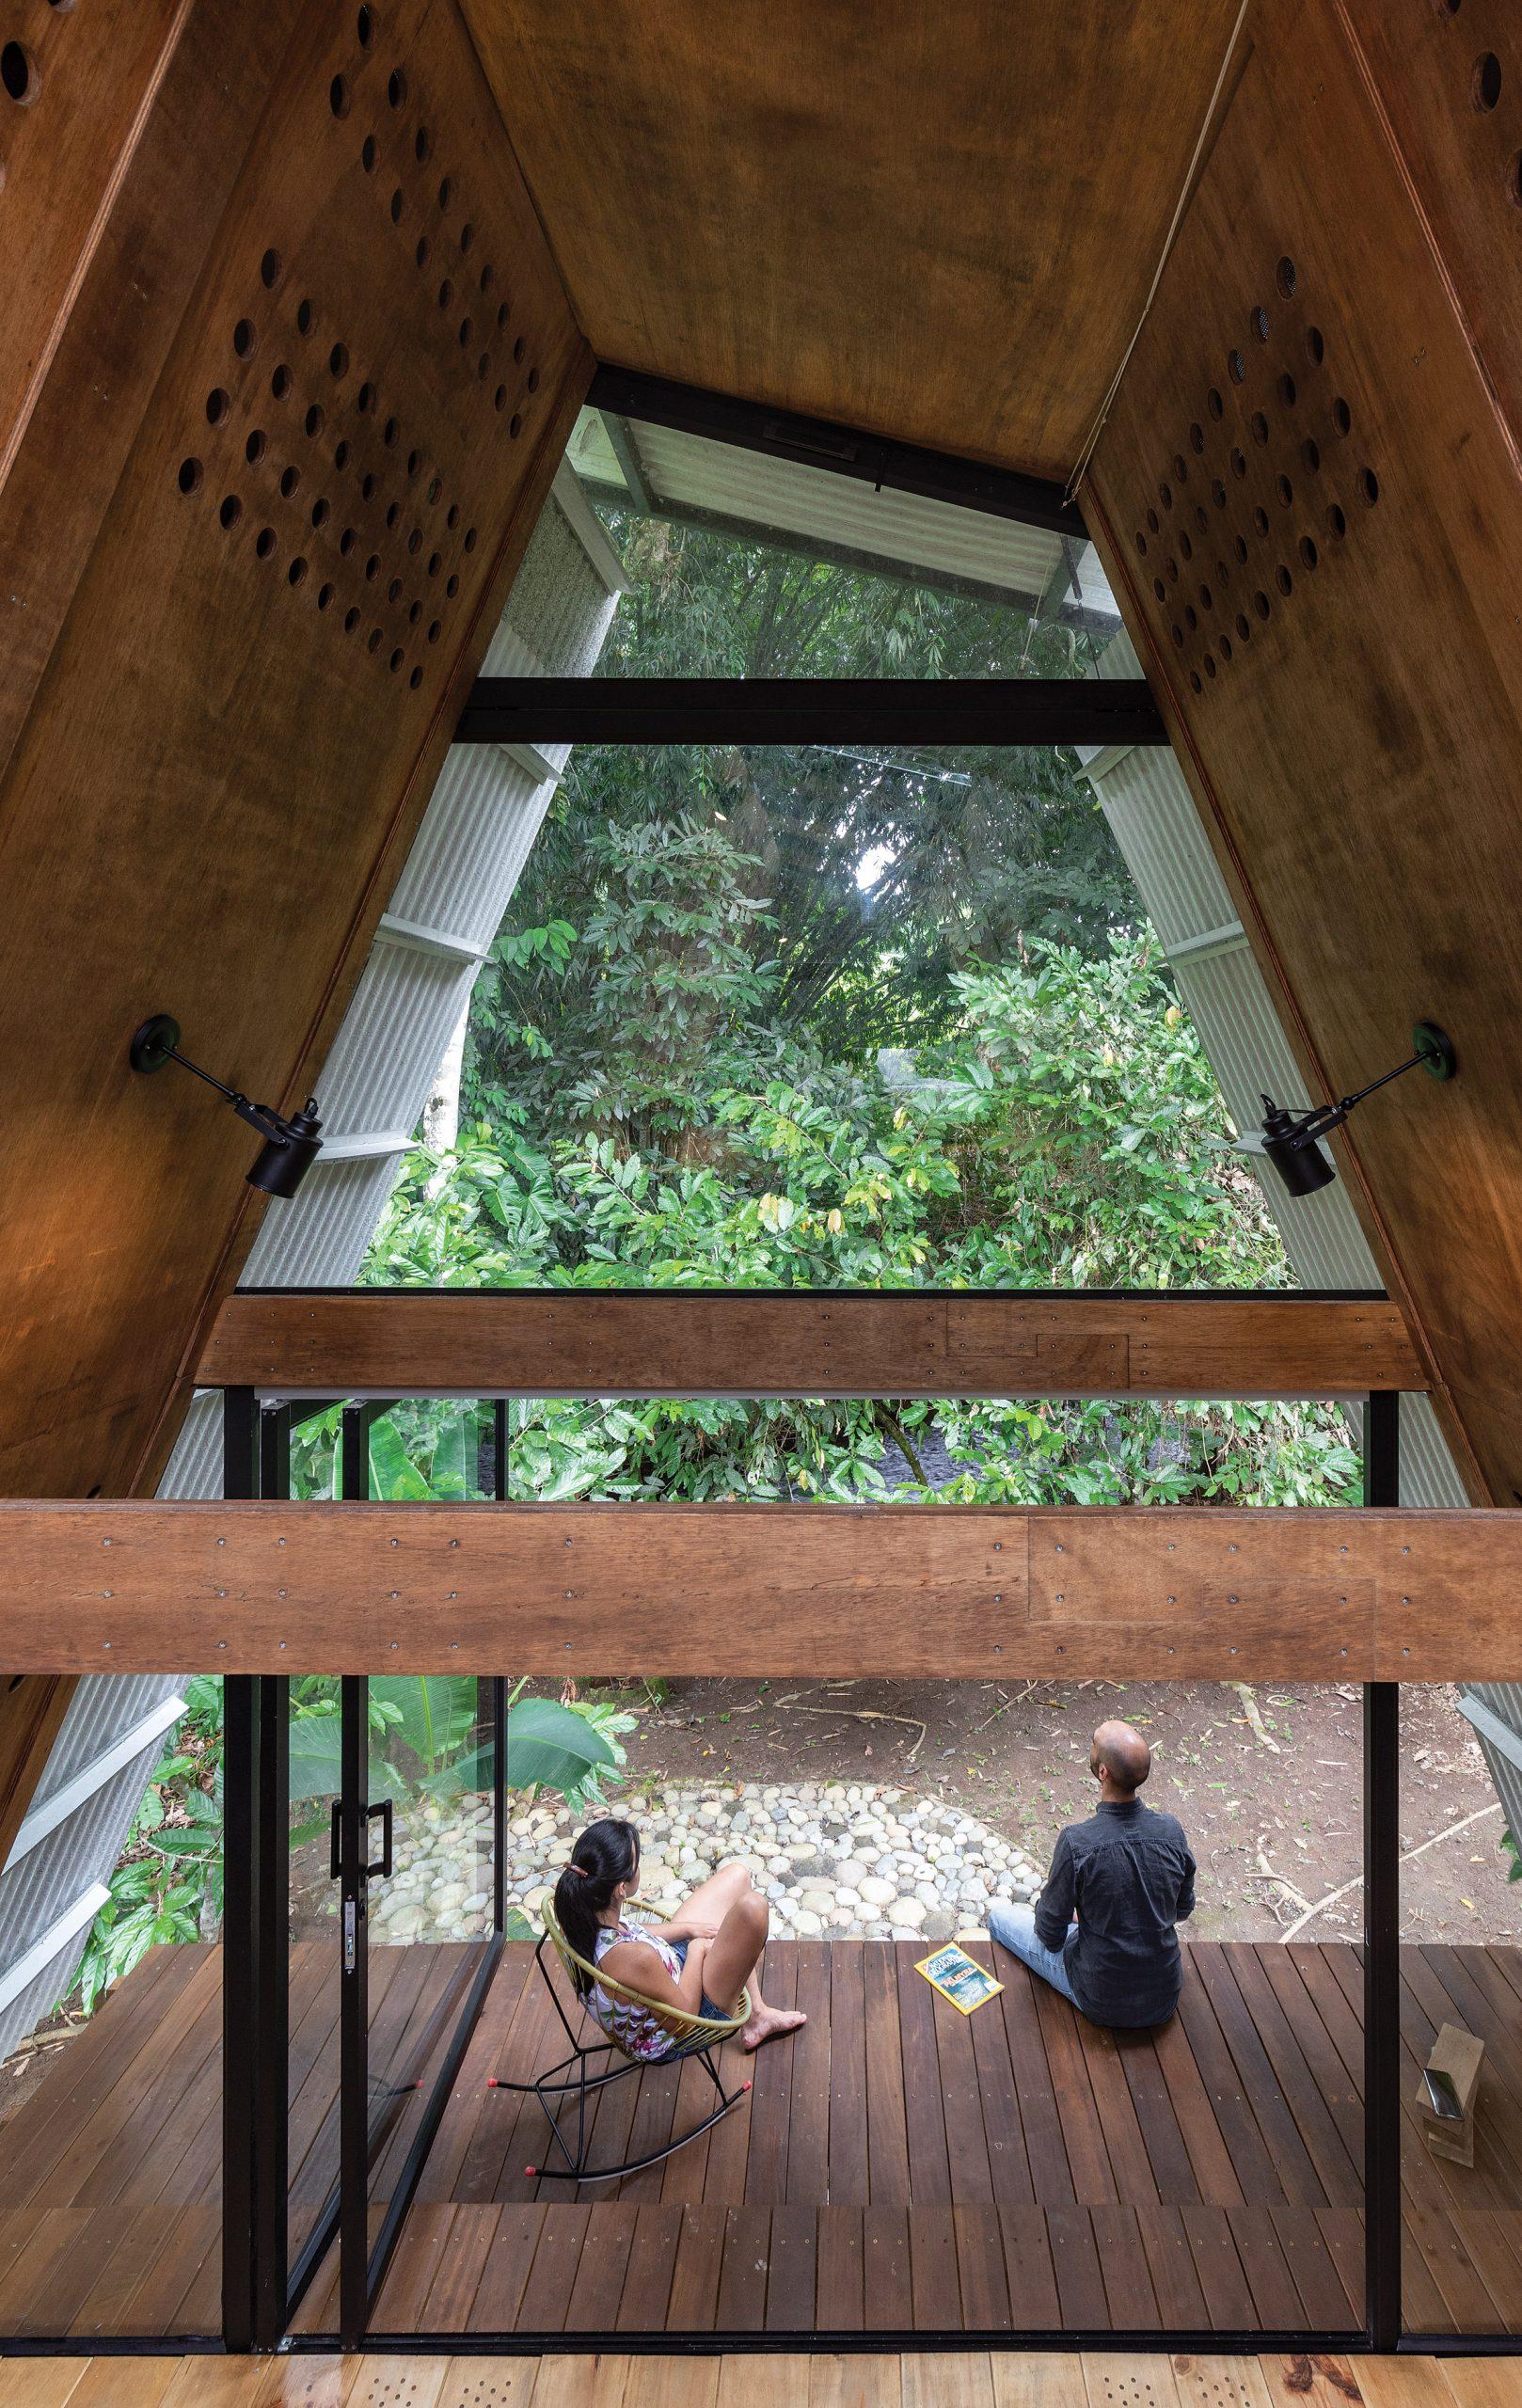 Inside the Huaira cabin by Diana Salvador and Javier Mera in Ecuador